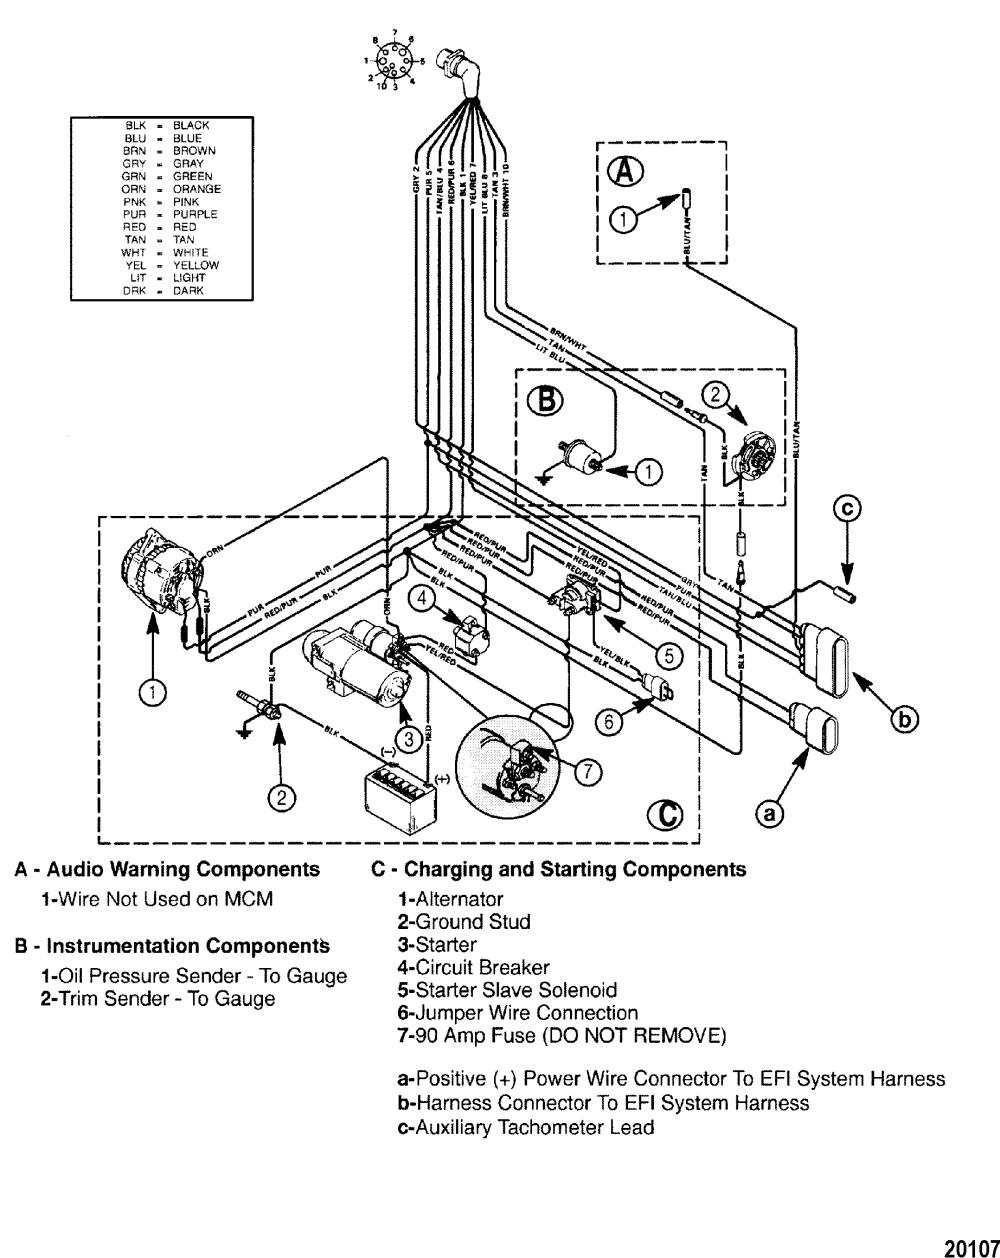 medium resolution of hardin marine wiring harness engine 502 mag mpi bravo gen 6 gm